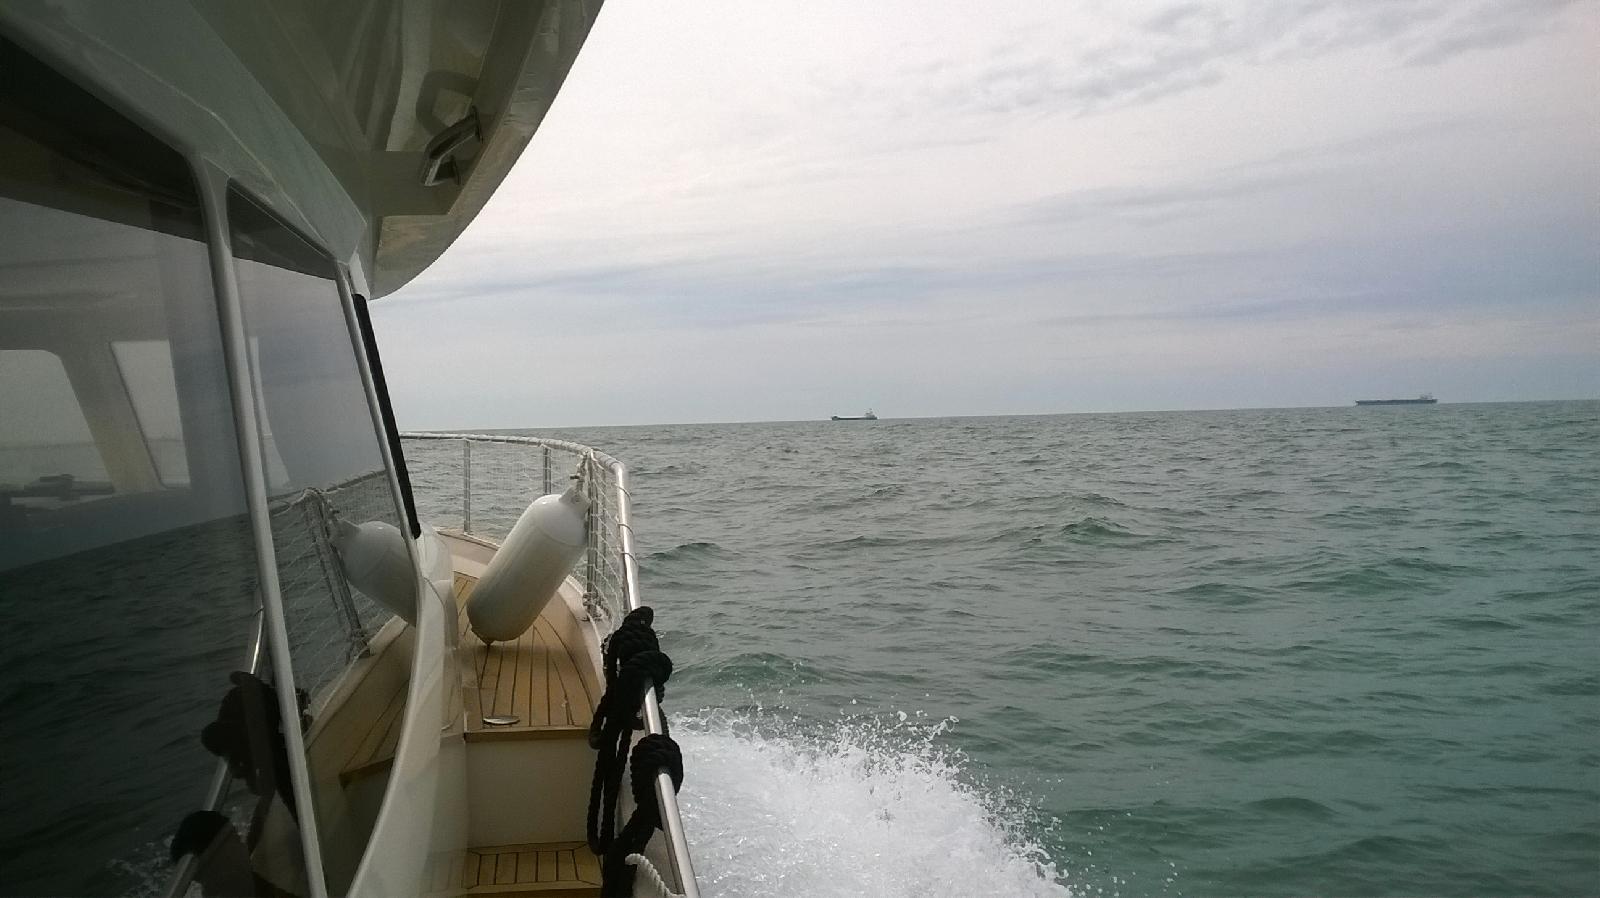 2016 du crouesty 224 l archipel toscan